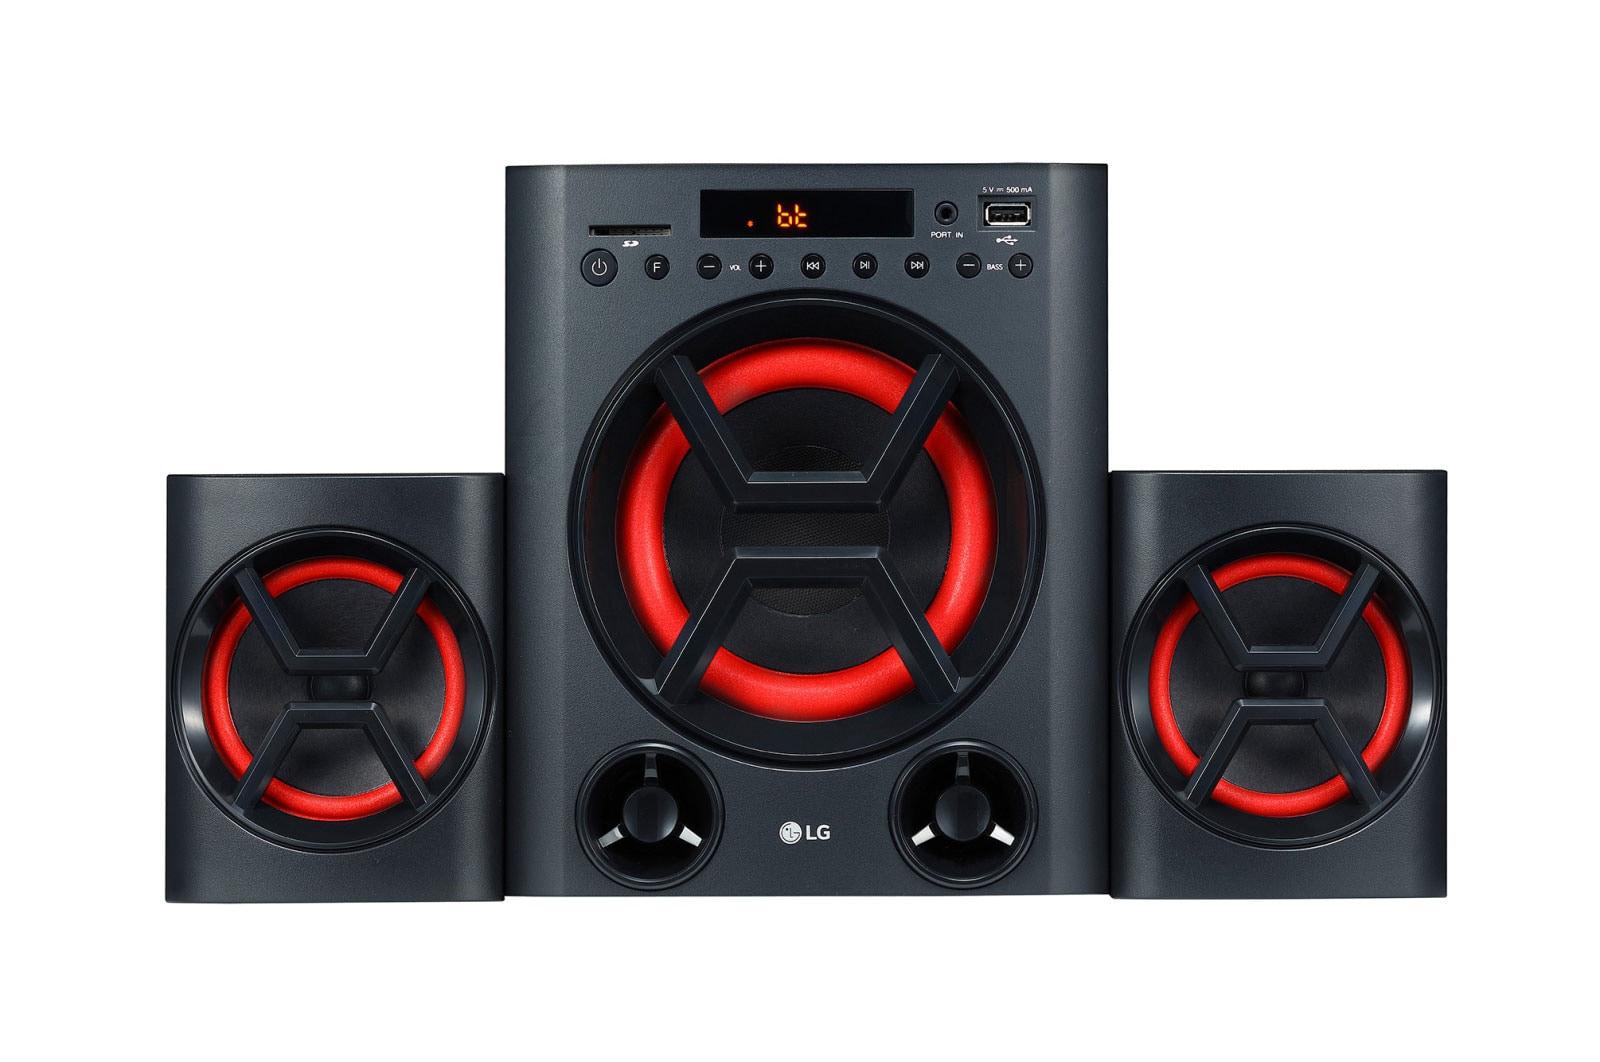 Lautsprecher & Soundsysteme Streng Bluetooth Lautsprecher Mobil Usb Sd Aux Mp3 Player Radio Box Sound System Neu